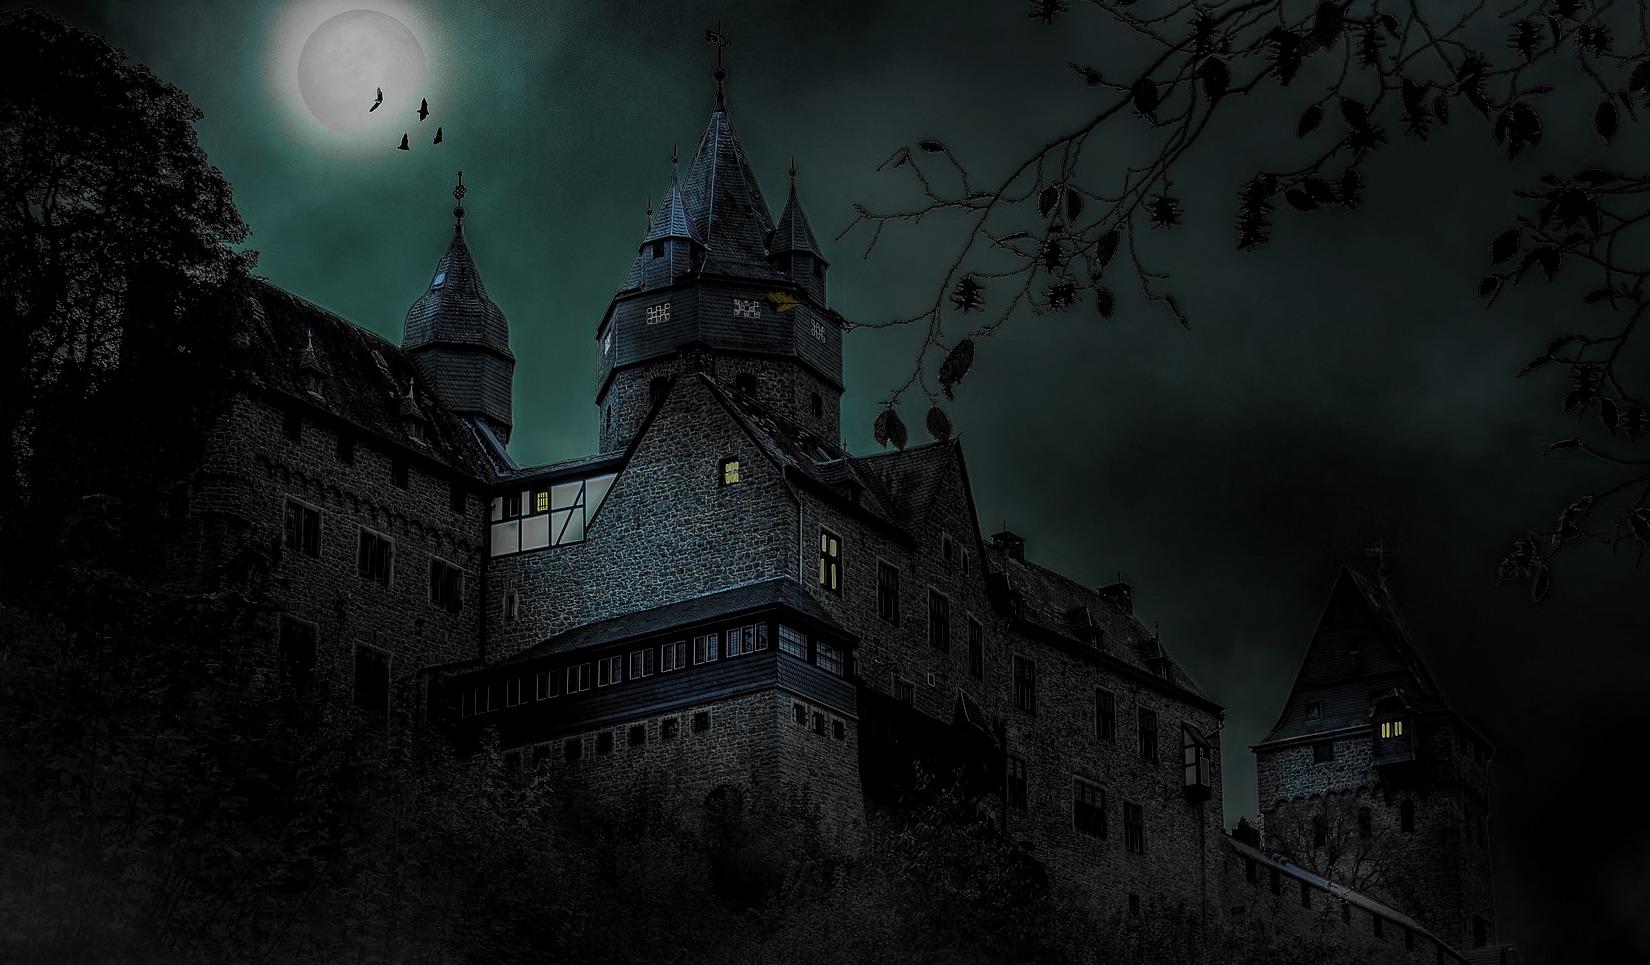 Zombie Apocalypse requiem VII and update 2.1.0 • Cryout ...